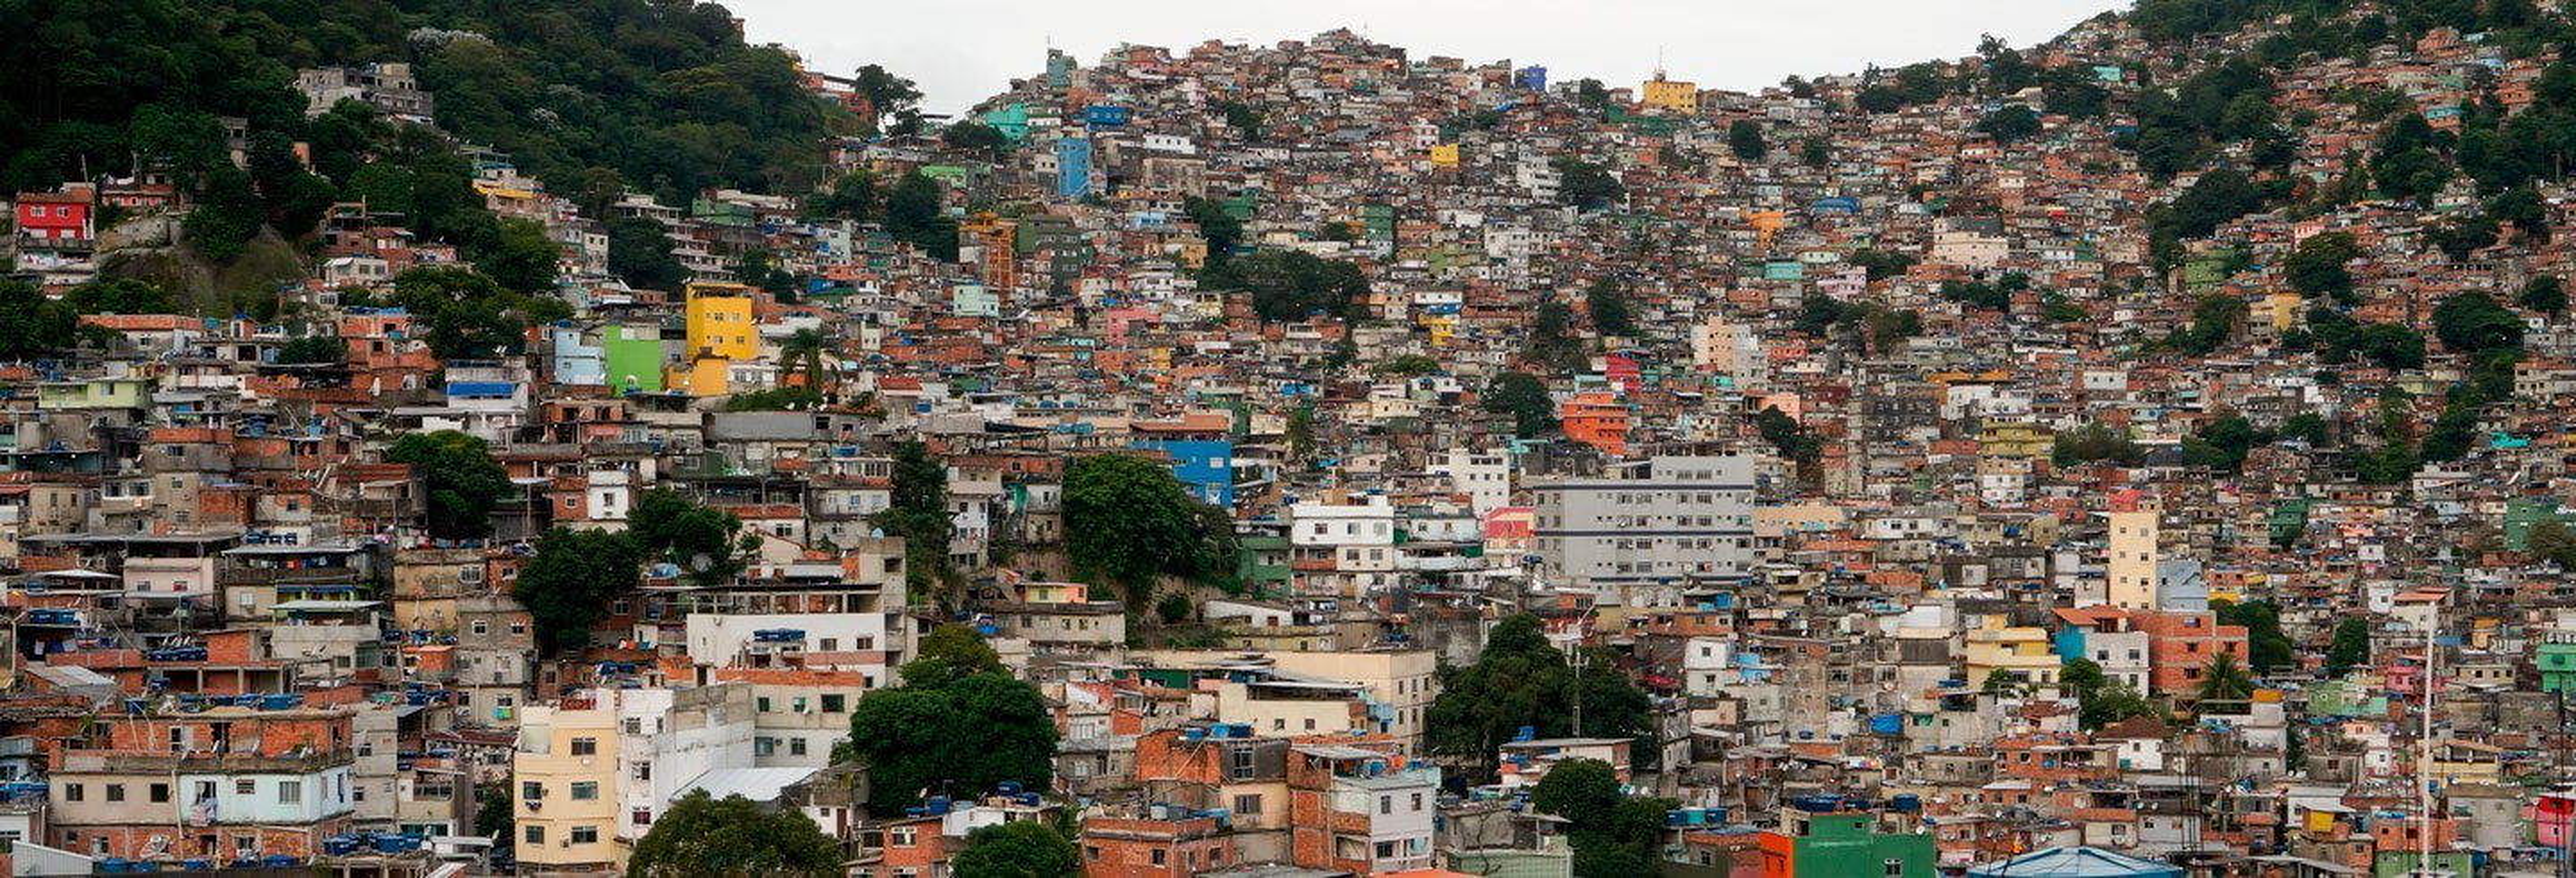 Tour por las favelas